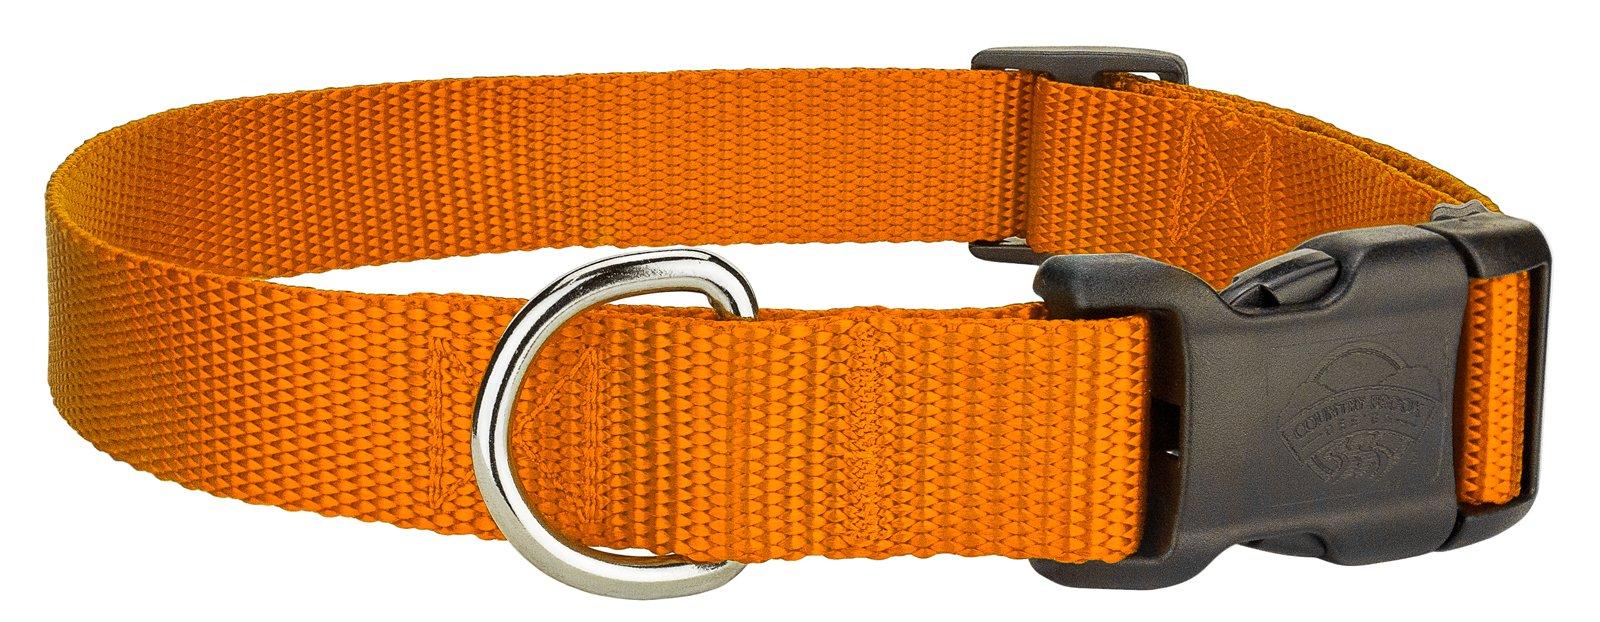 Country Brook Design 10 - Deluxe Nylon Dog Collars - Orange - Extra Small